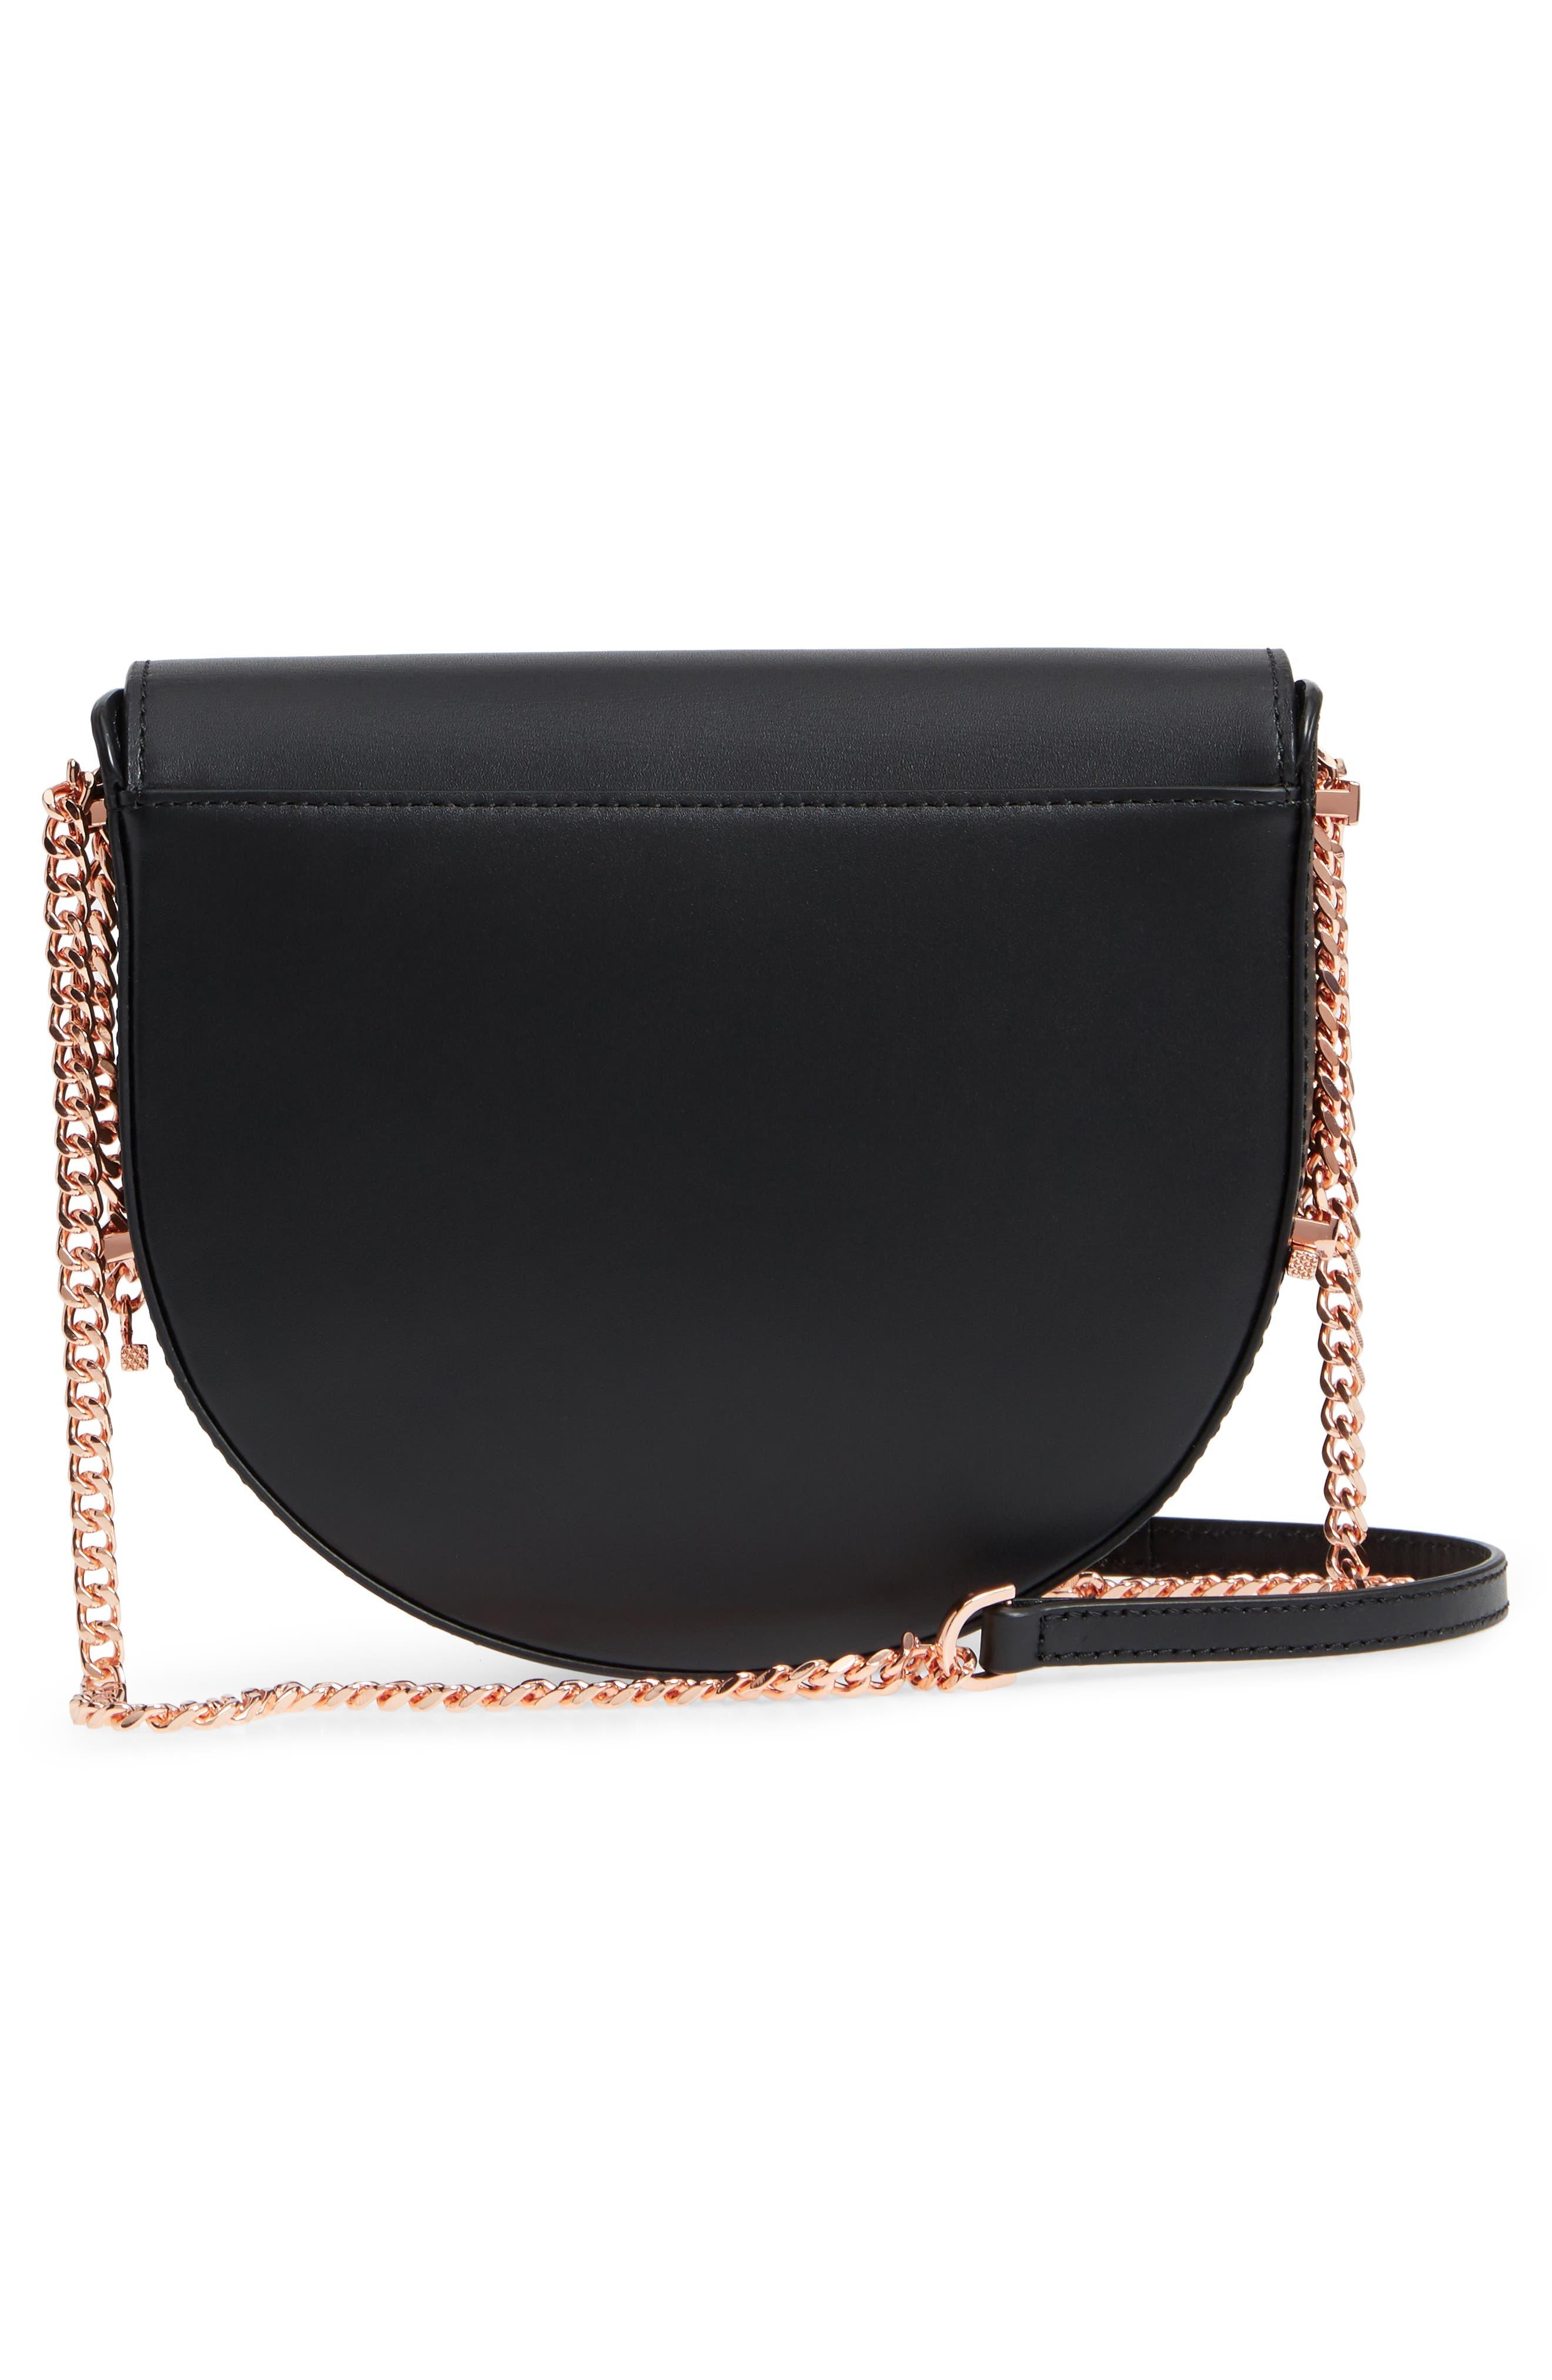 Roslyn Leather Crossbody Bag,                             Alternate thumbnail 3, color,                             Black